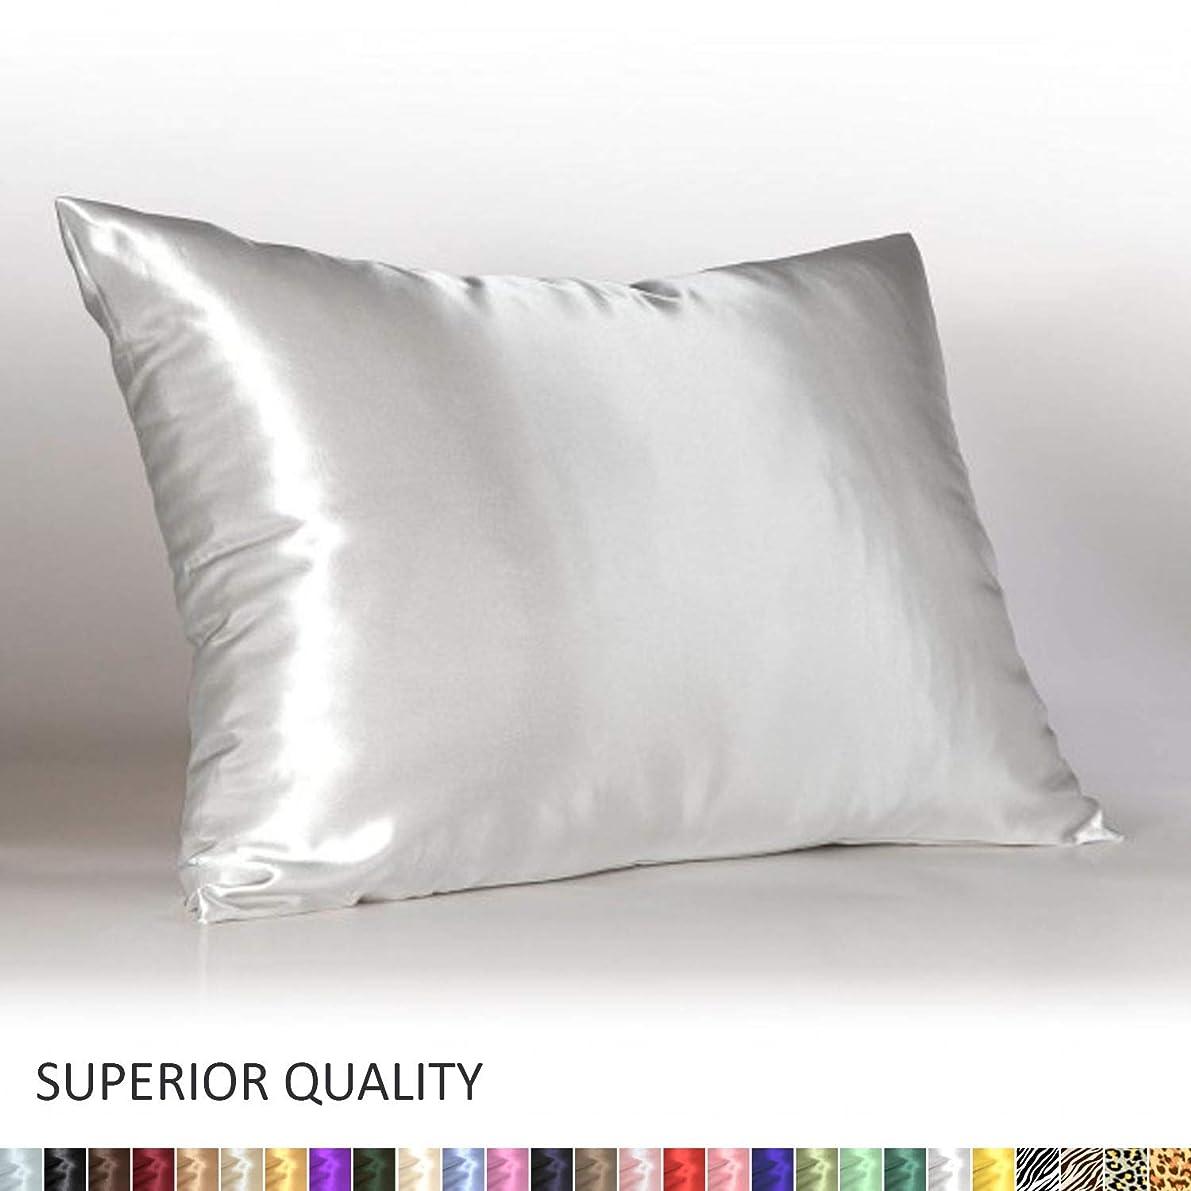 Shop Bedding Luxury Satin Pillowcase for Hair – Standard Satin Pillowcase with Zipper, White (1 per Pack) – Blissford